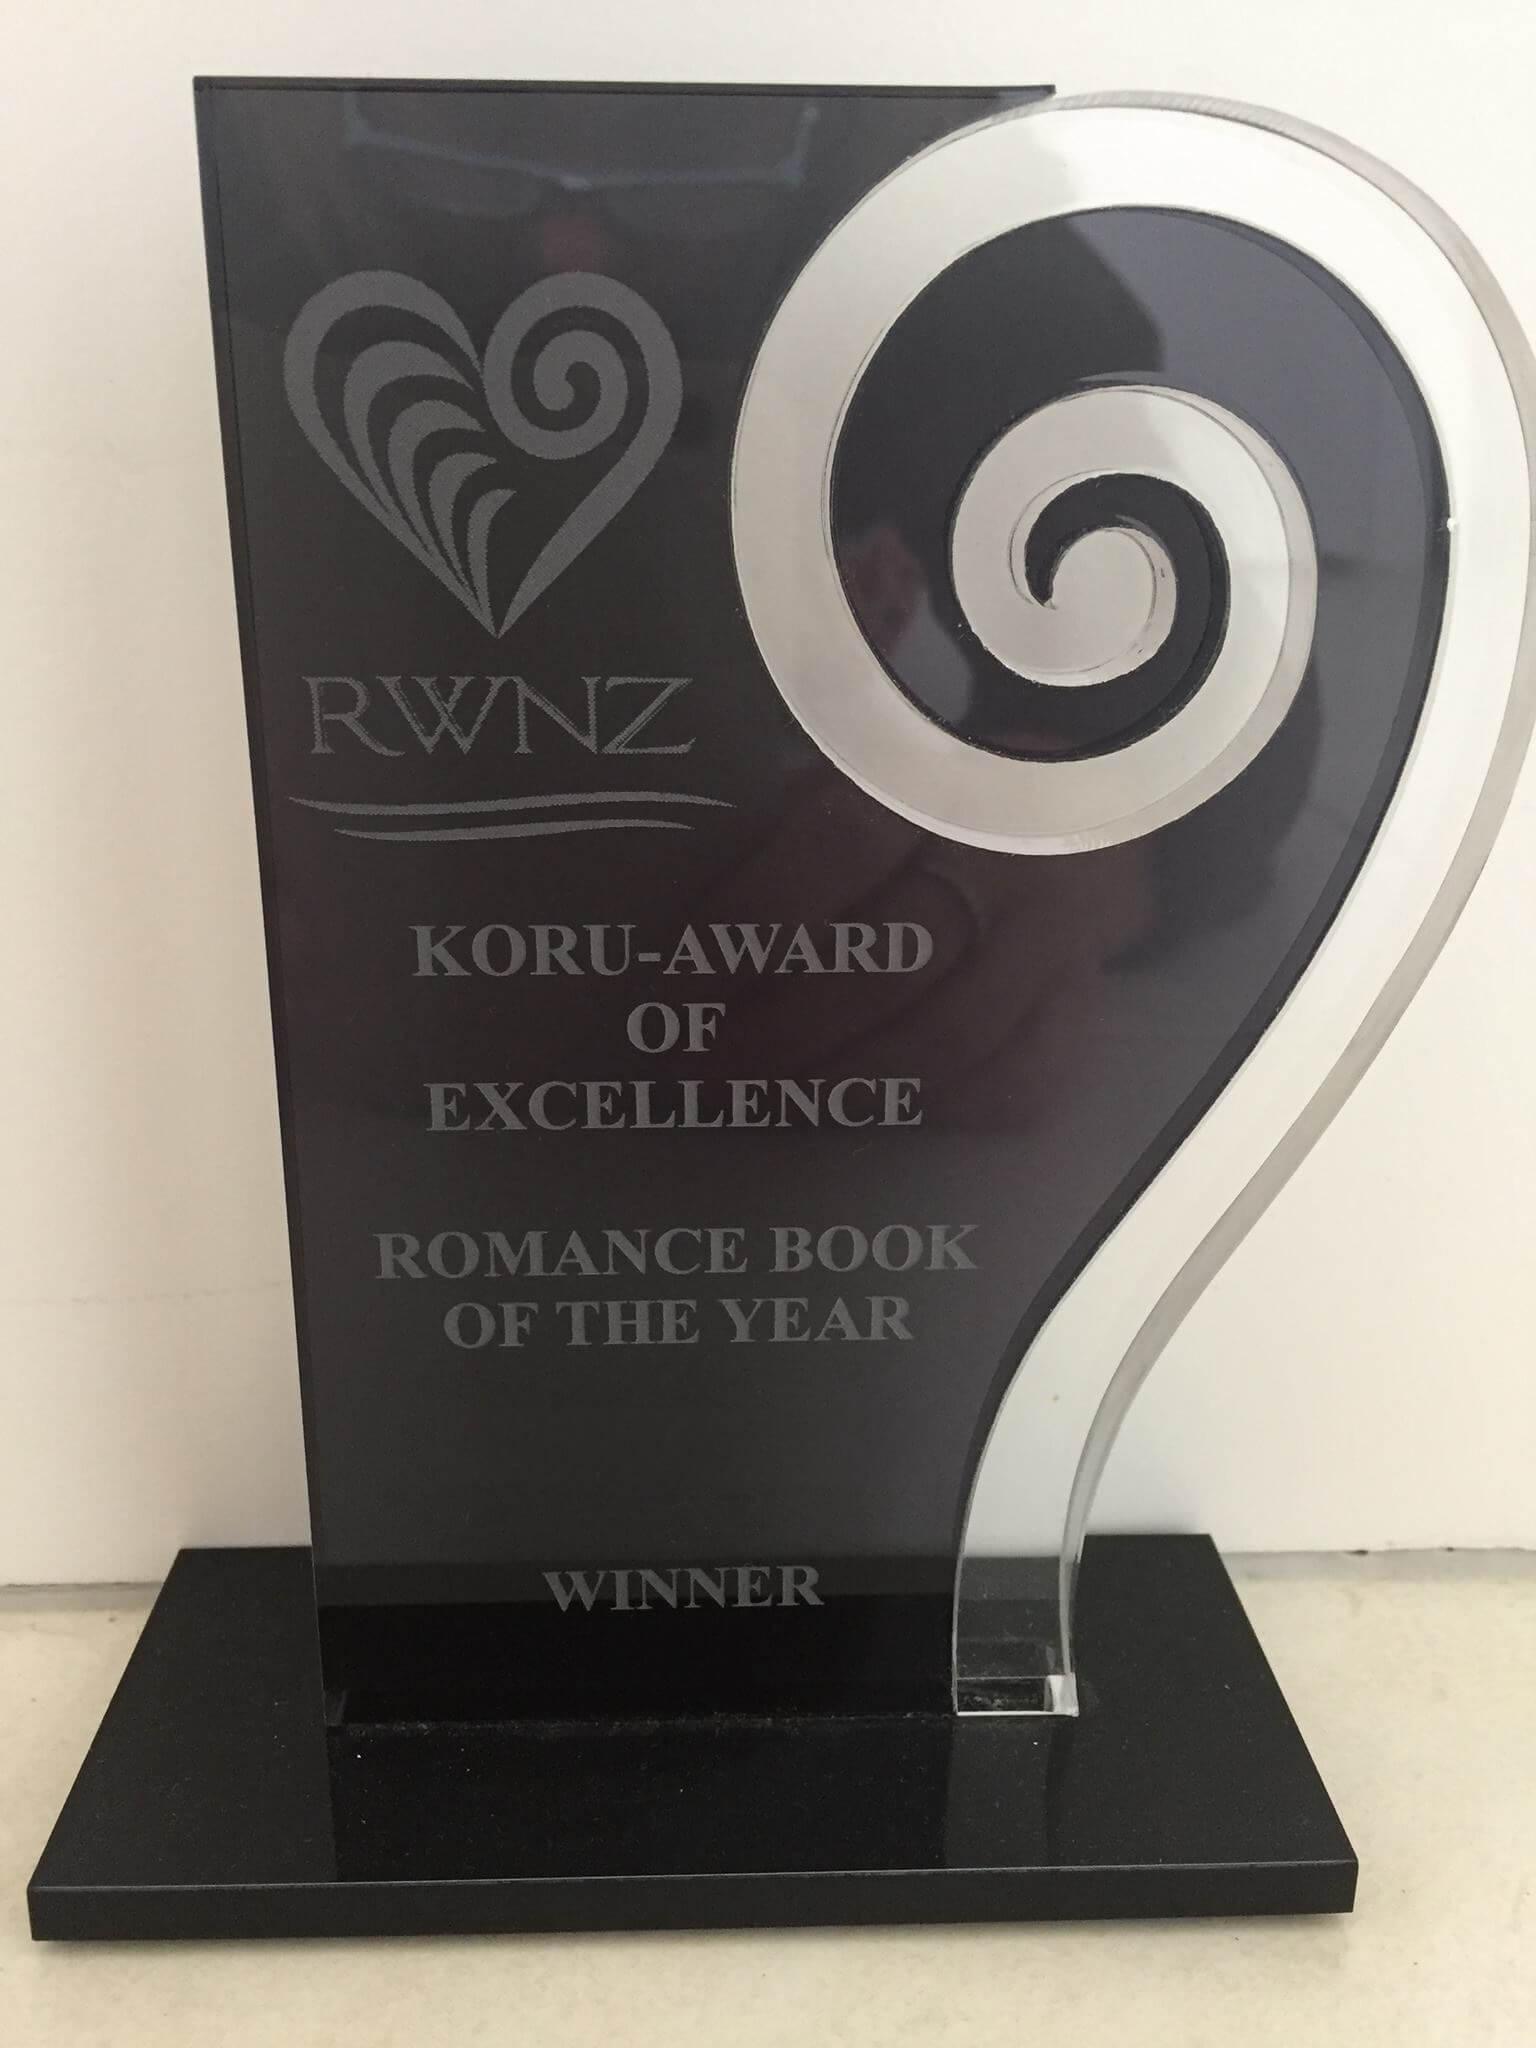 Koru Award trophy